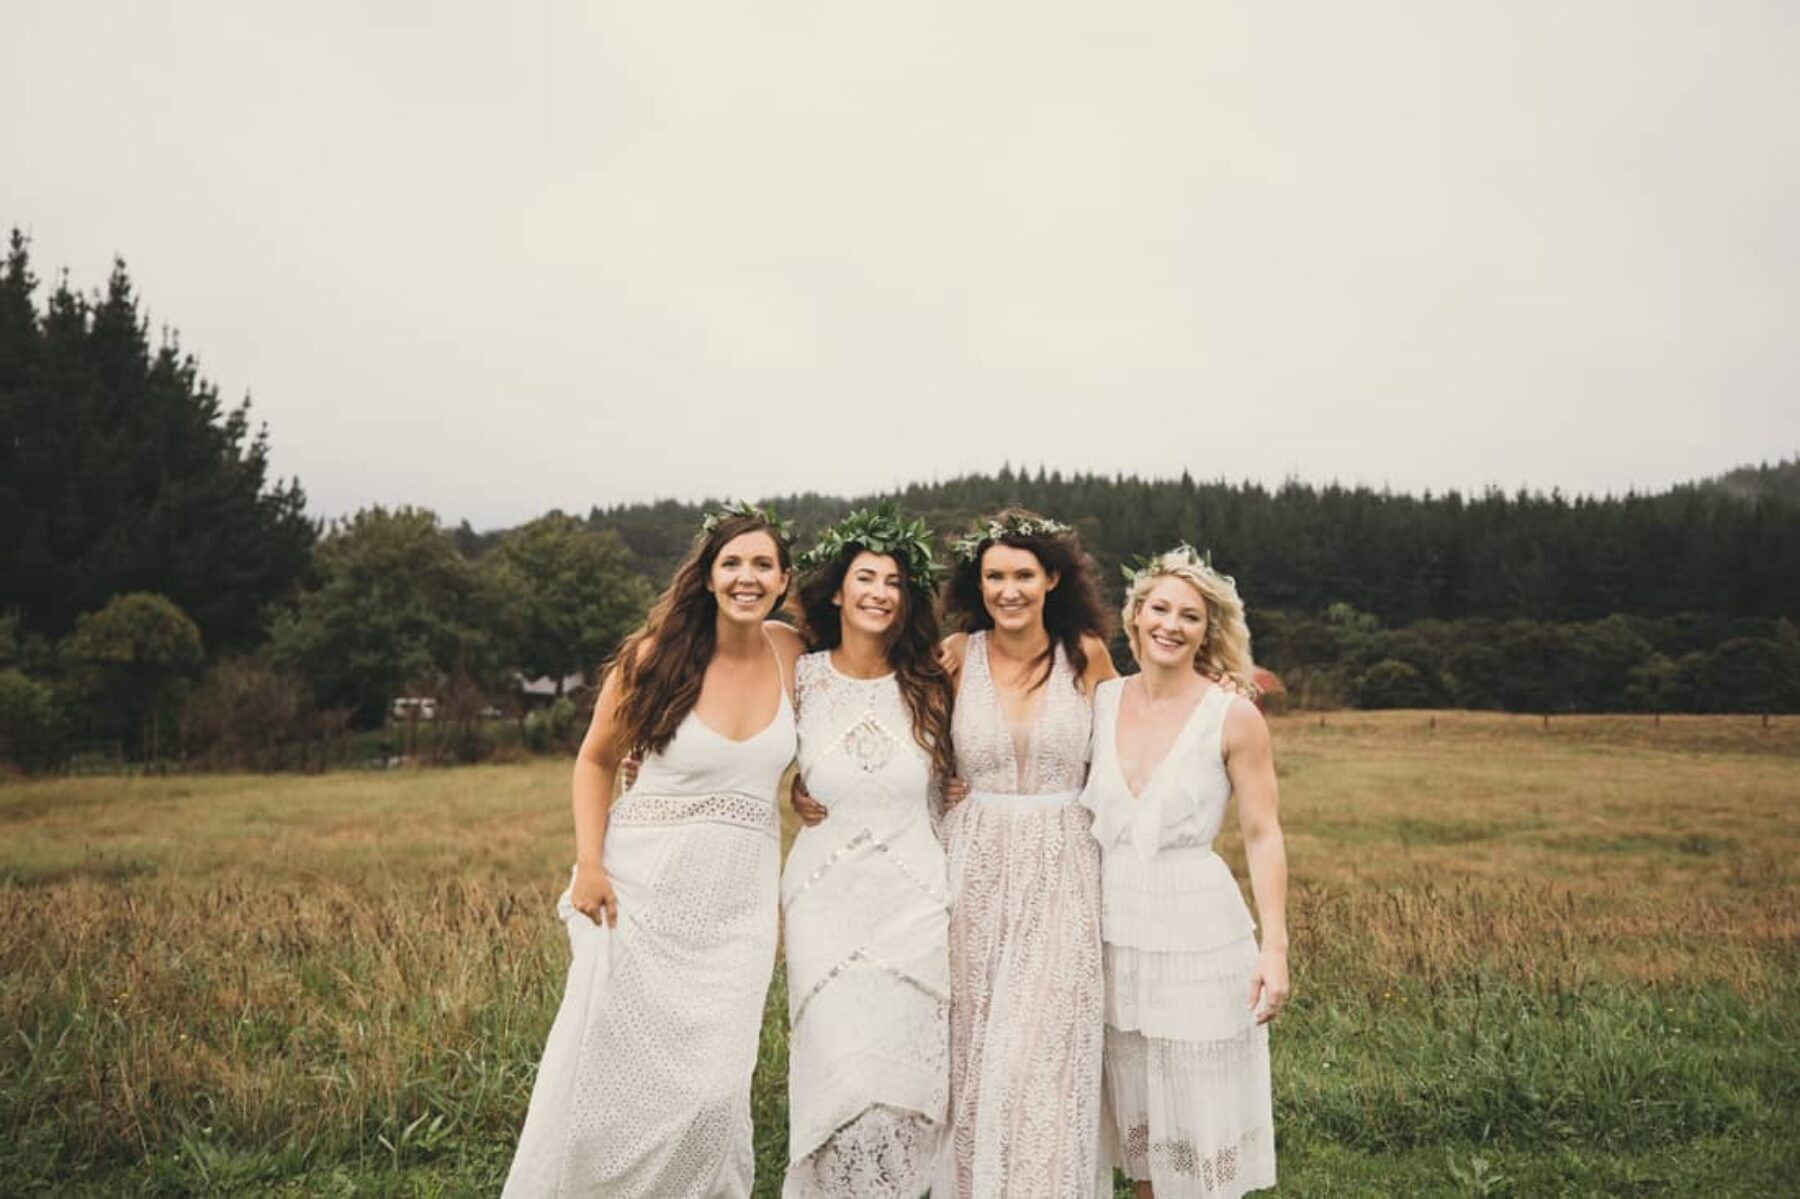 boho bridesmaids in mixed white dresses